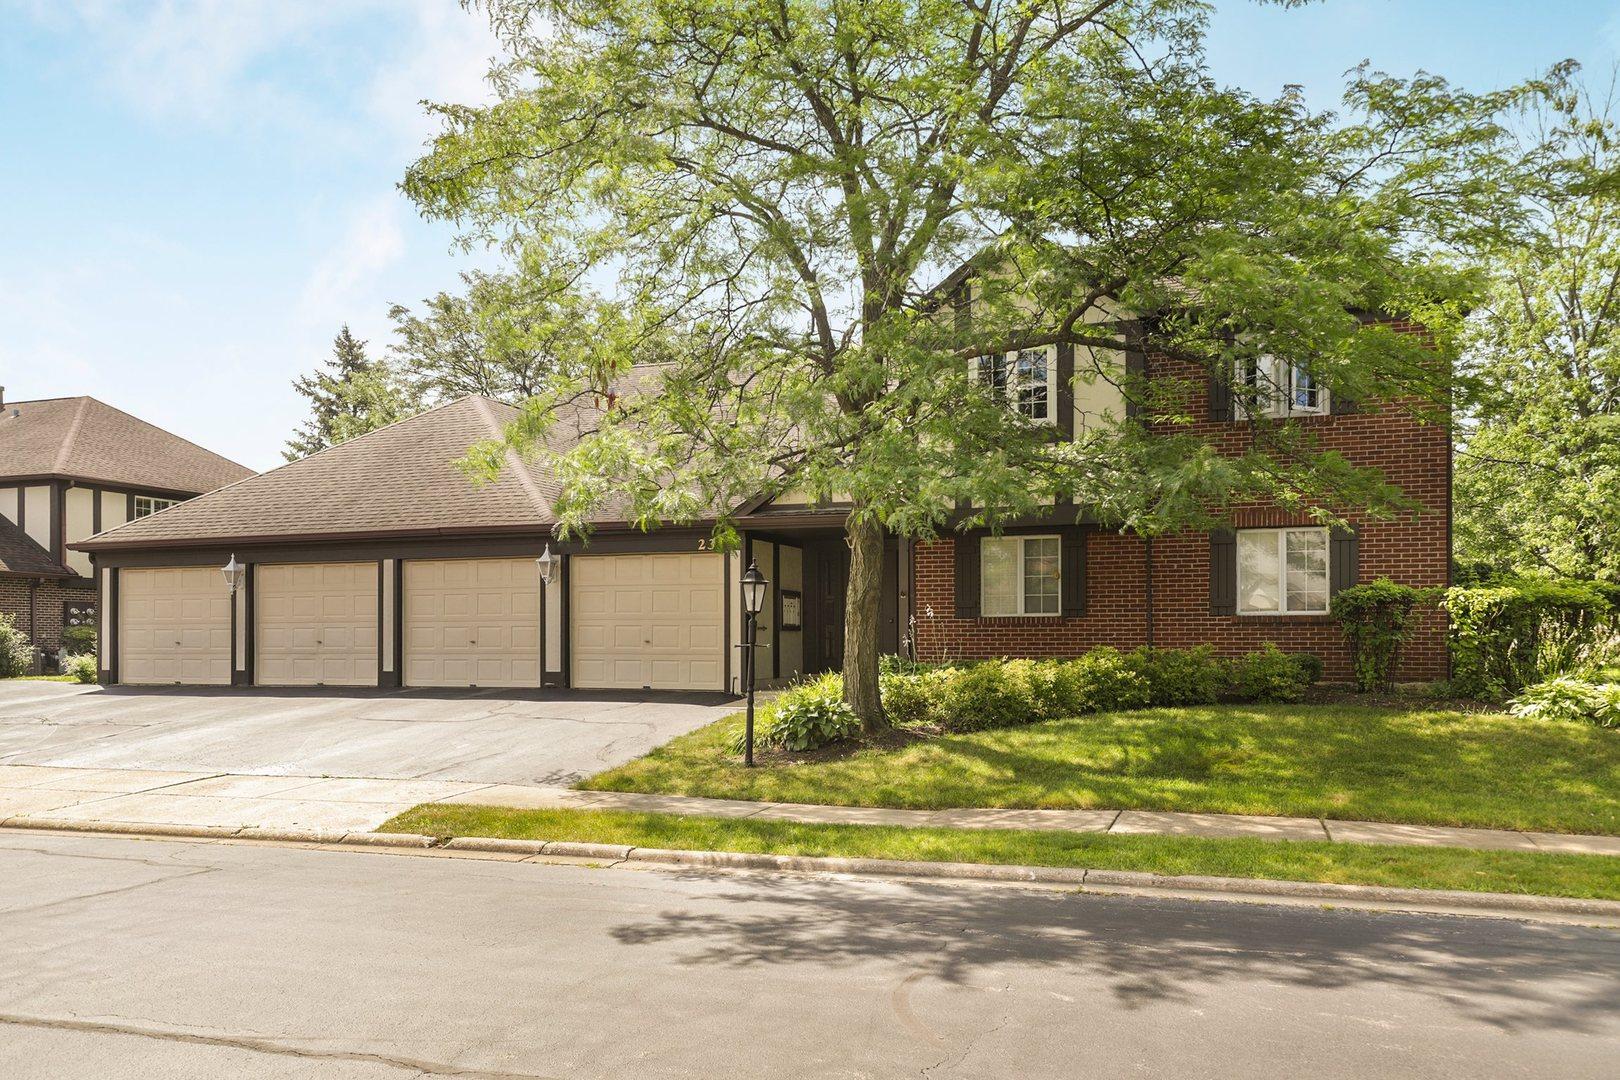 231 Stanhope C, WILLOWBROOK, Illinois, 60527